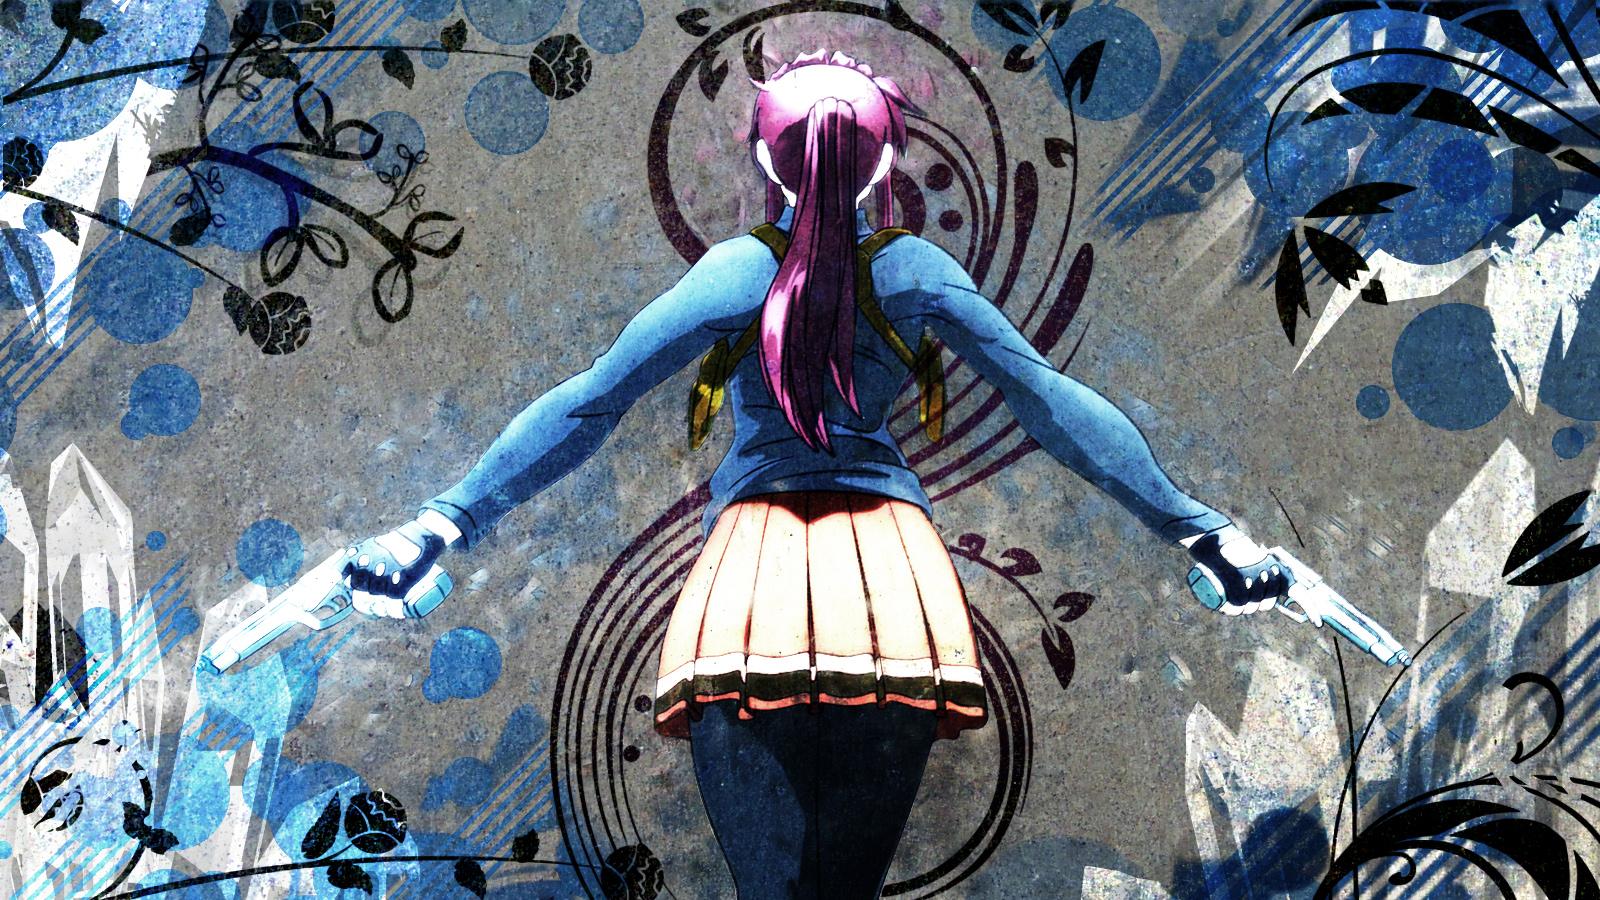 Naruto And Hinata Wallpaper 3d Black Lagoon Hd Wallpaper 1600x900 Your Daily Anime